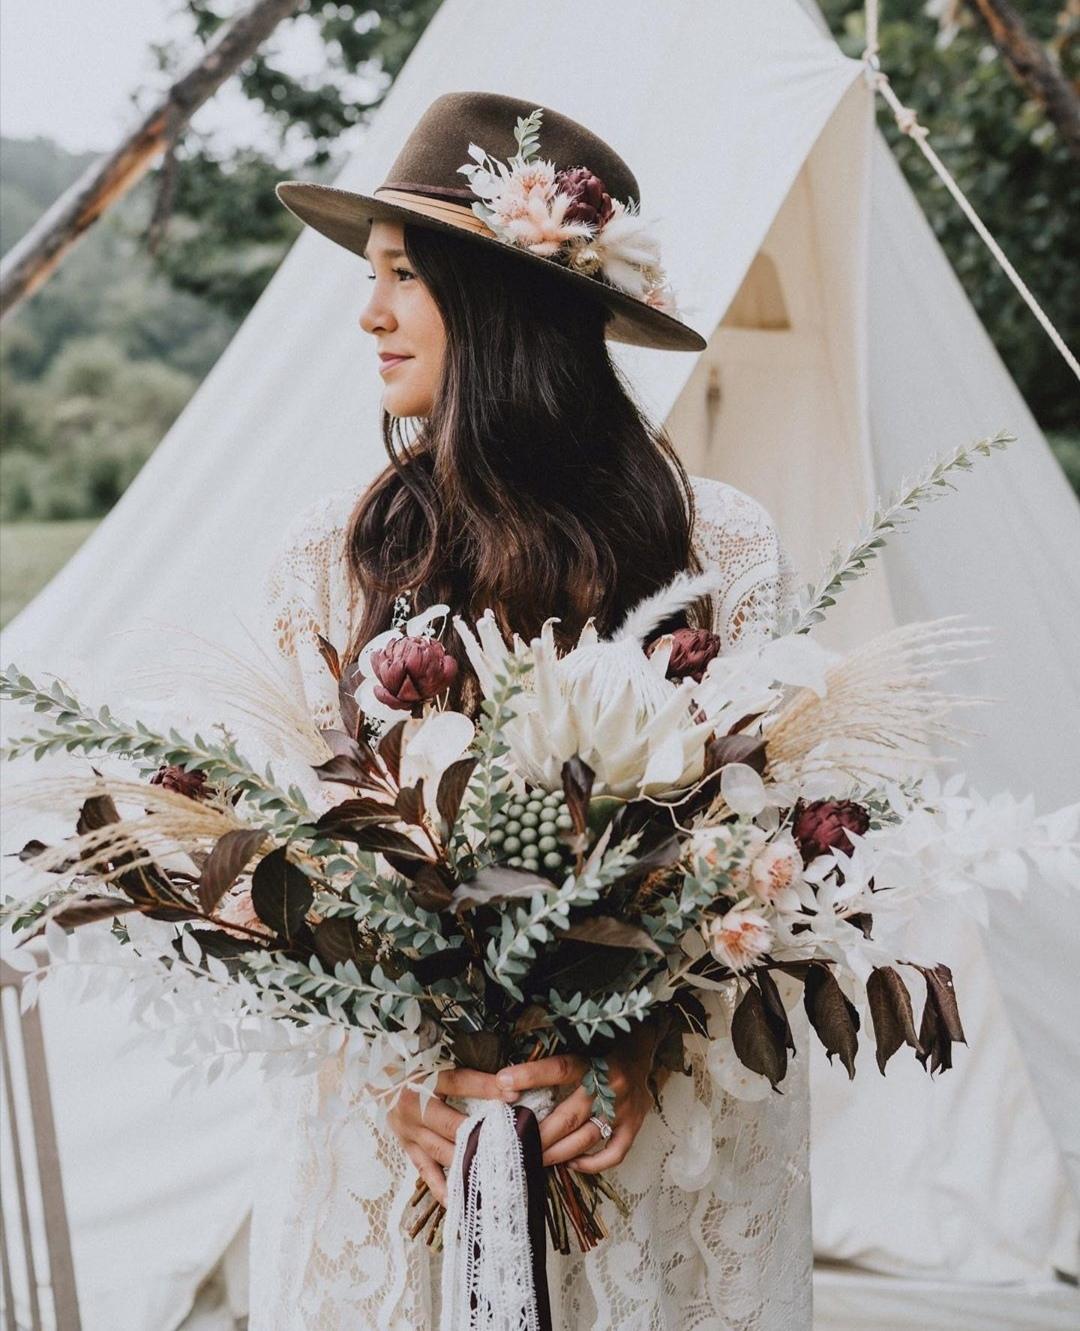 Protea Bridal bouquets